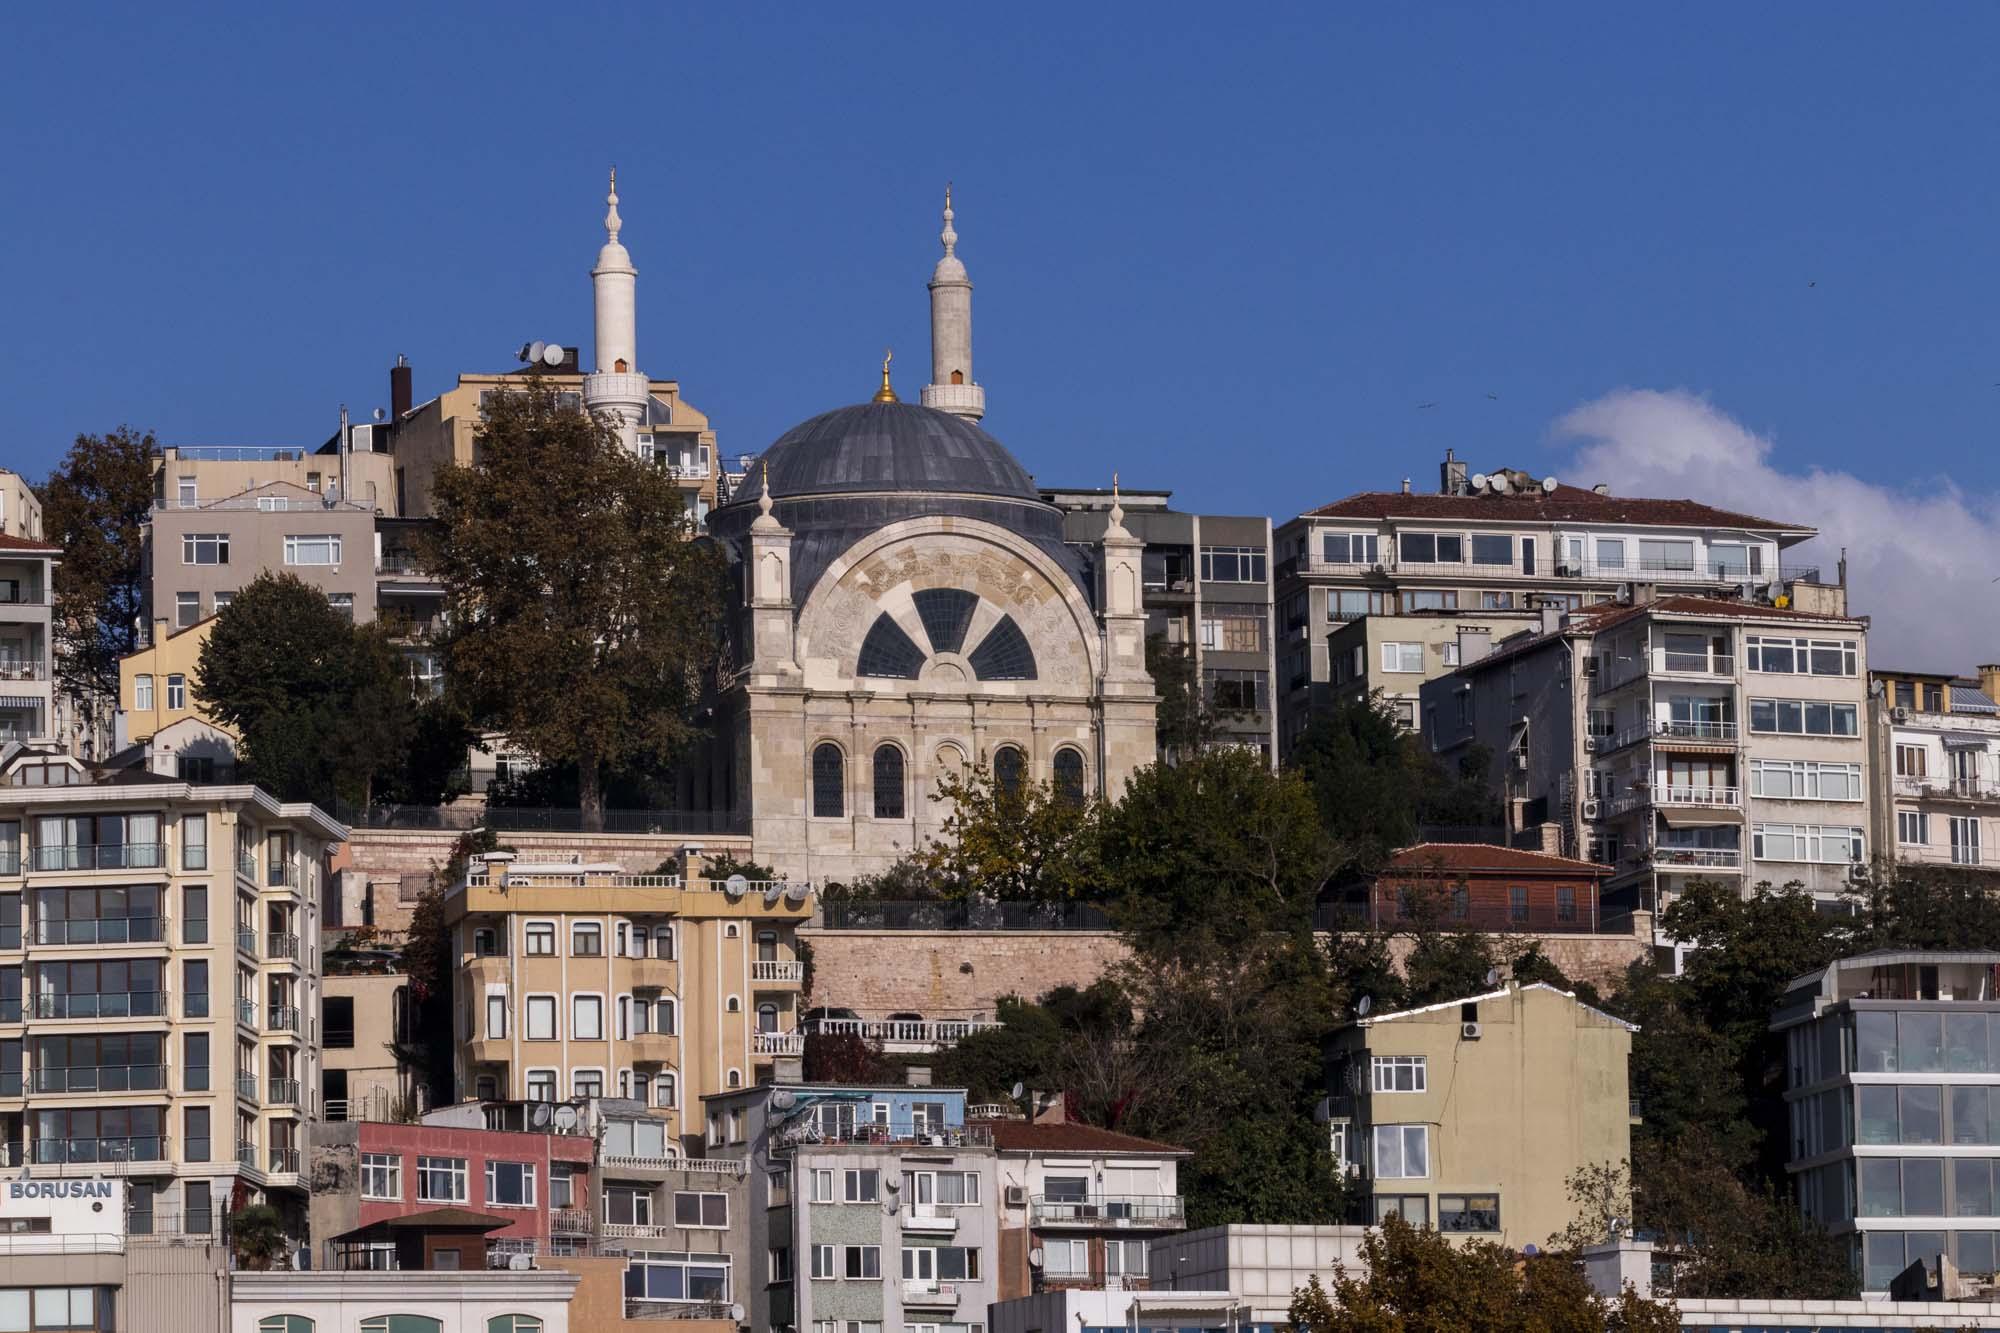 Cihangir Camii dans la ville d'İstanbul en Turquie